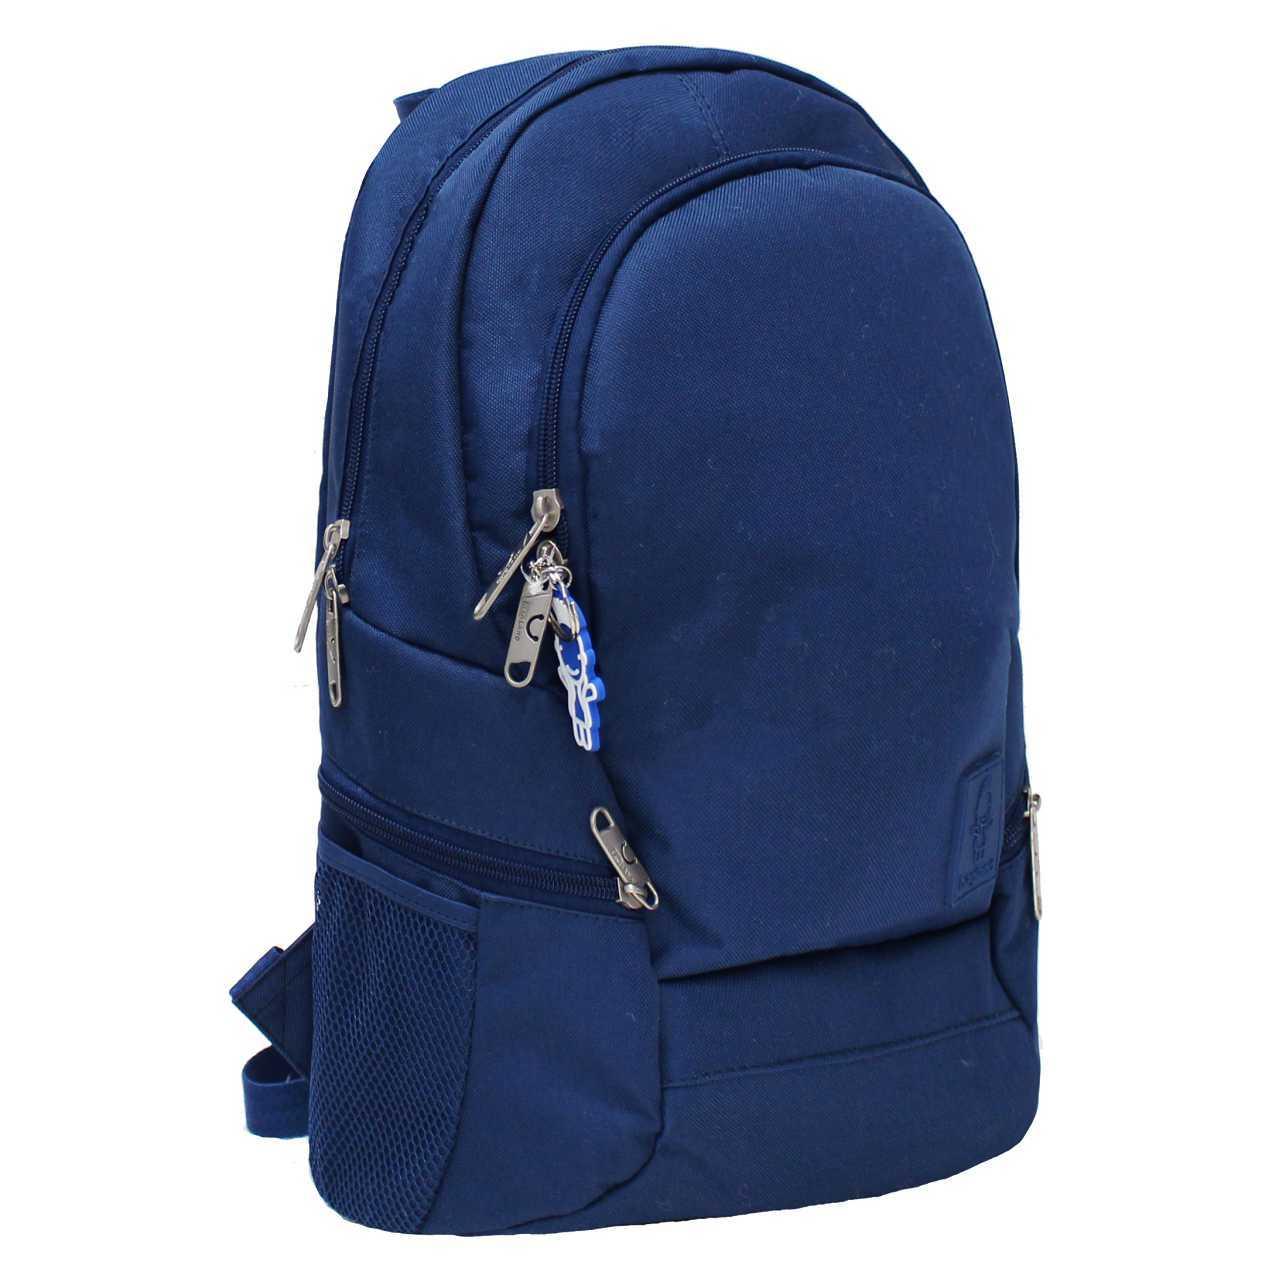 Городские рюкзаки Рюкзак Bagland Urban 20 л. Синий (0053066) IMG_4129.jpg